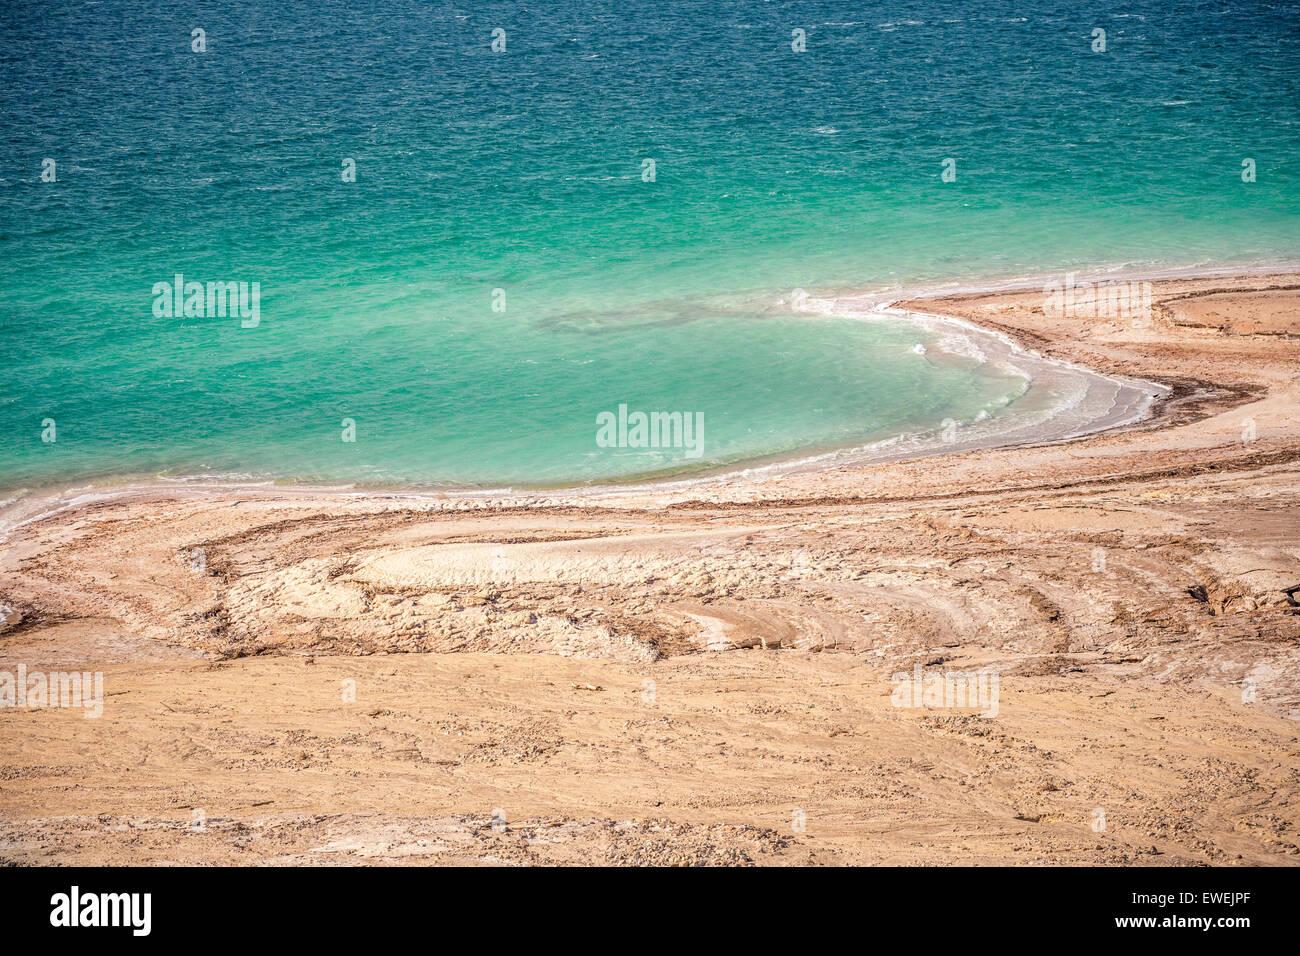 View of Dead Sea coastline - Stock Image